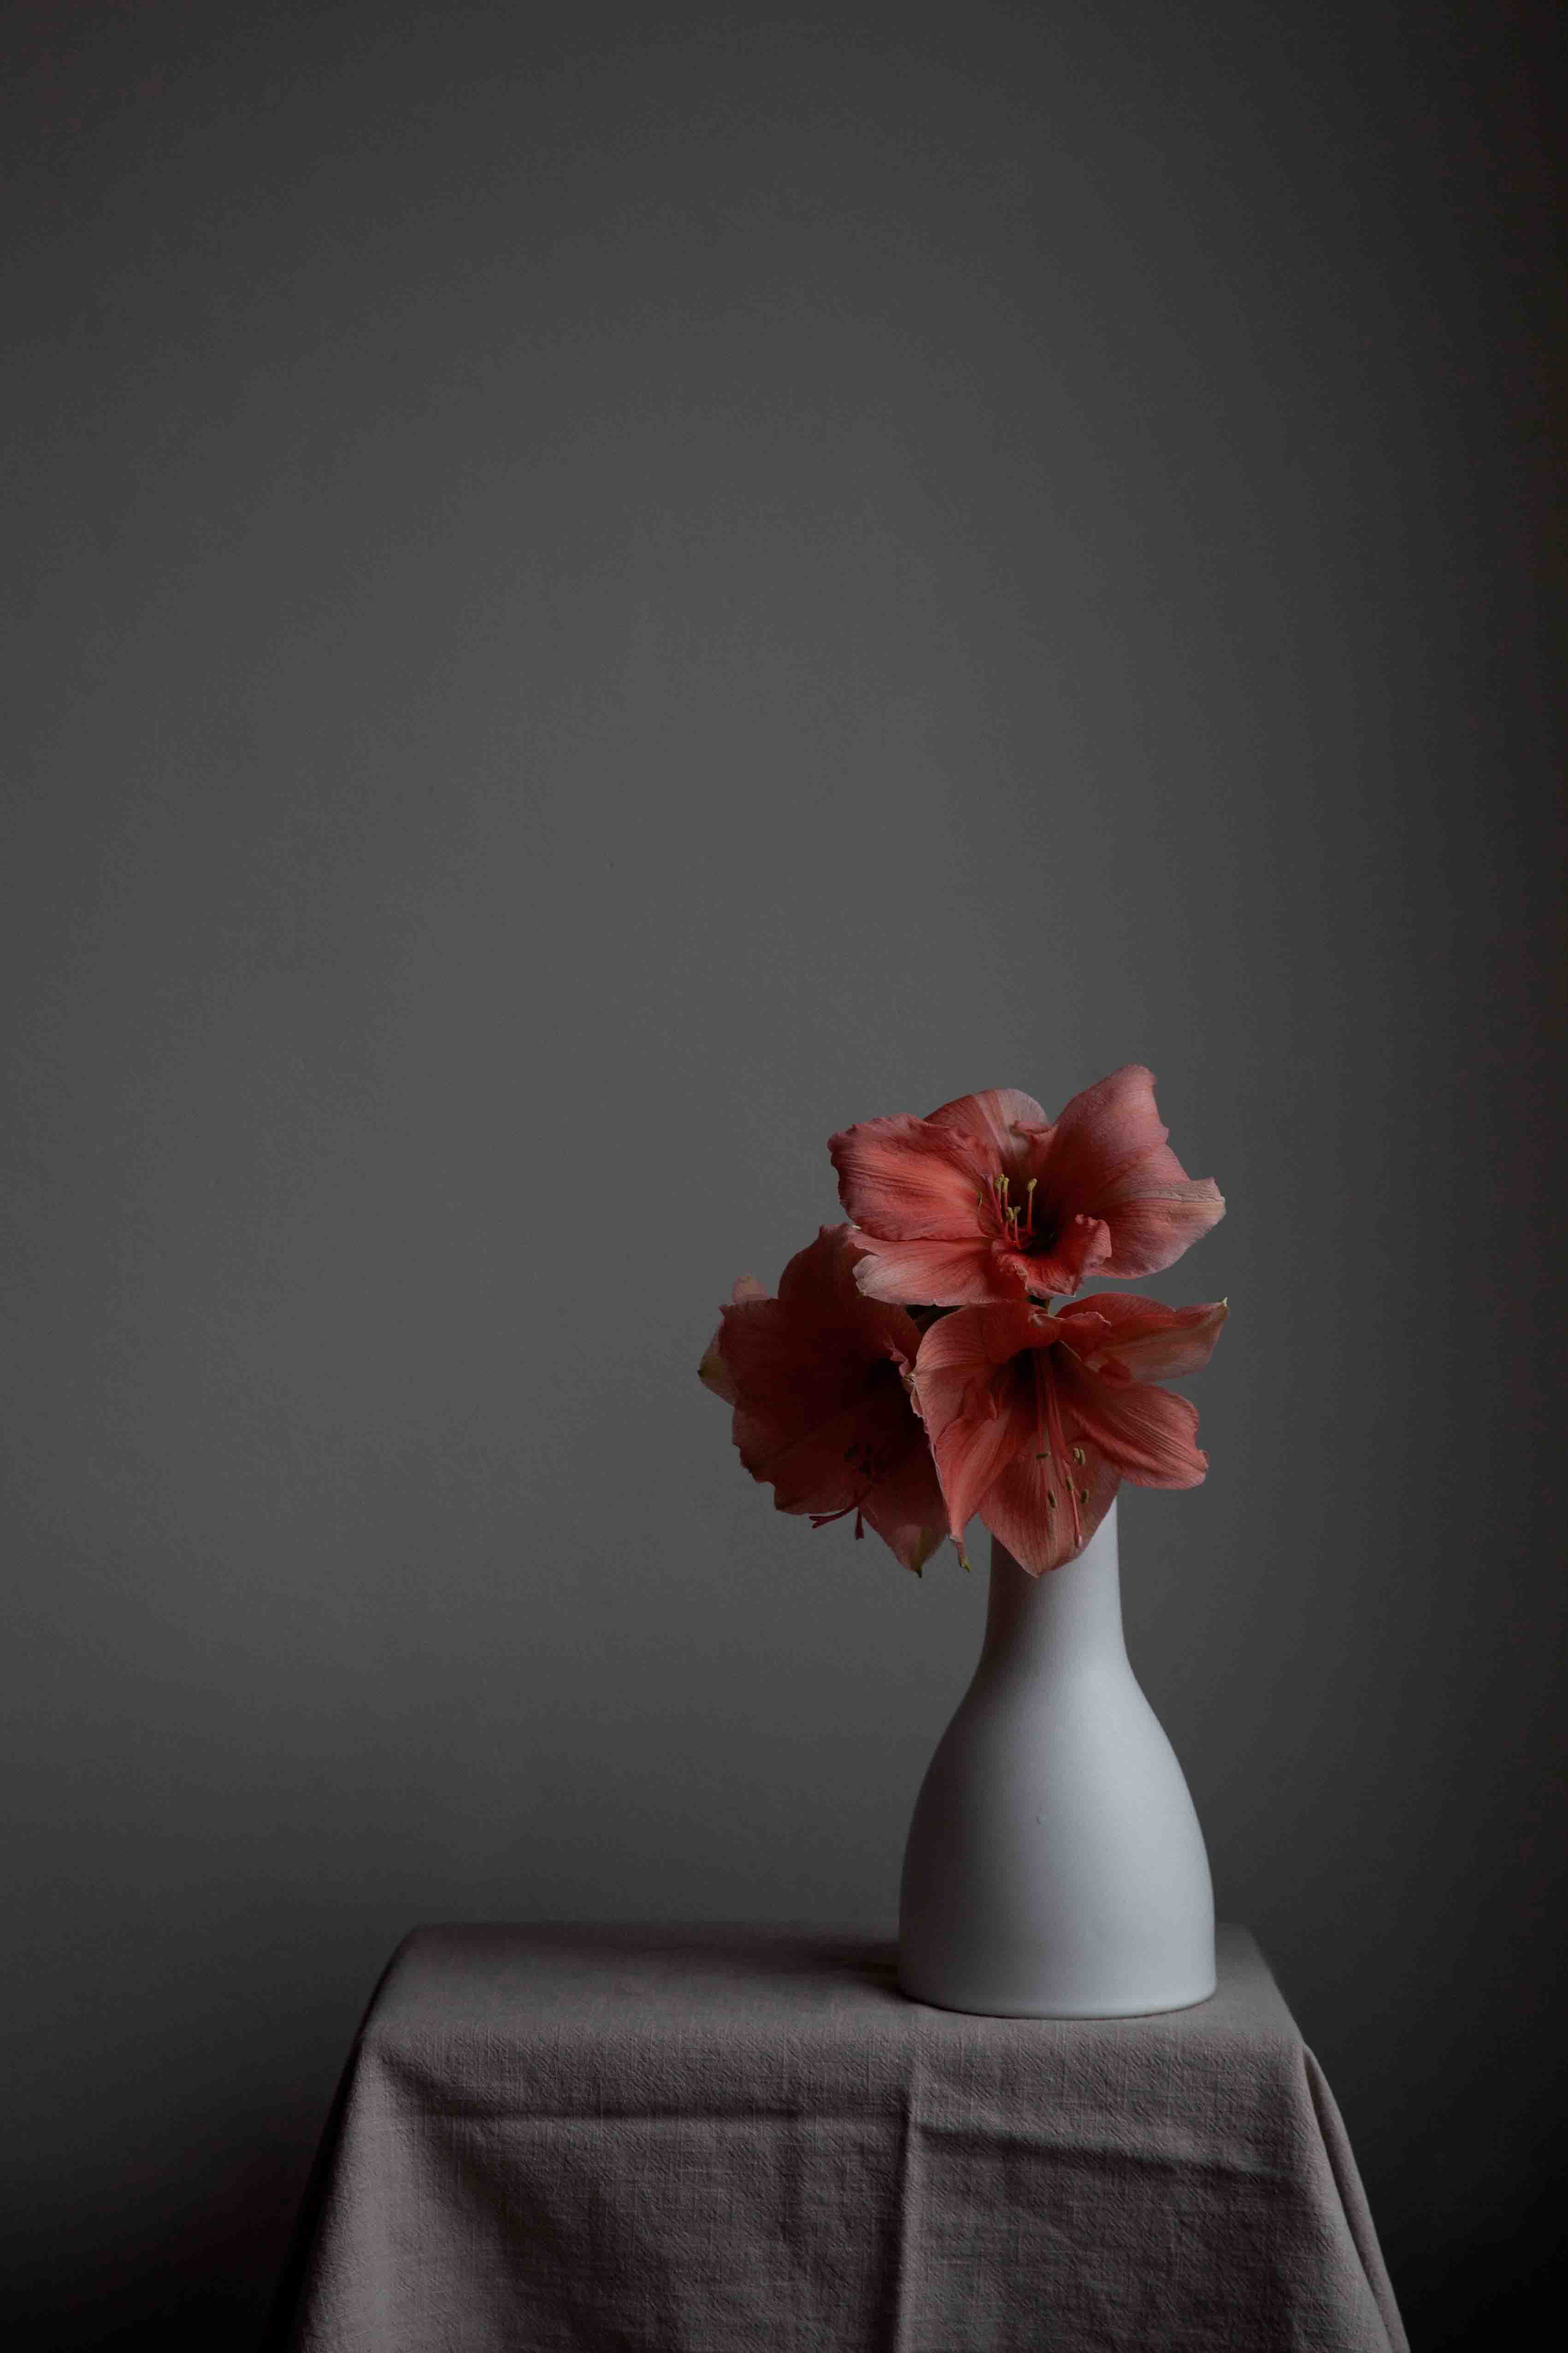 Stillography